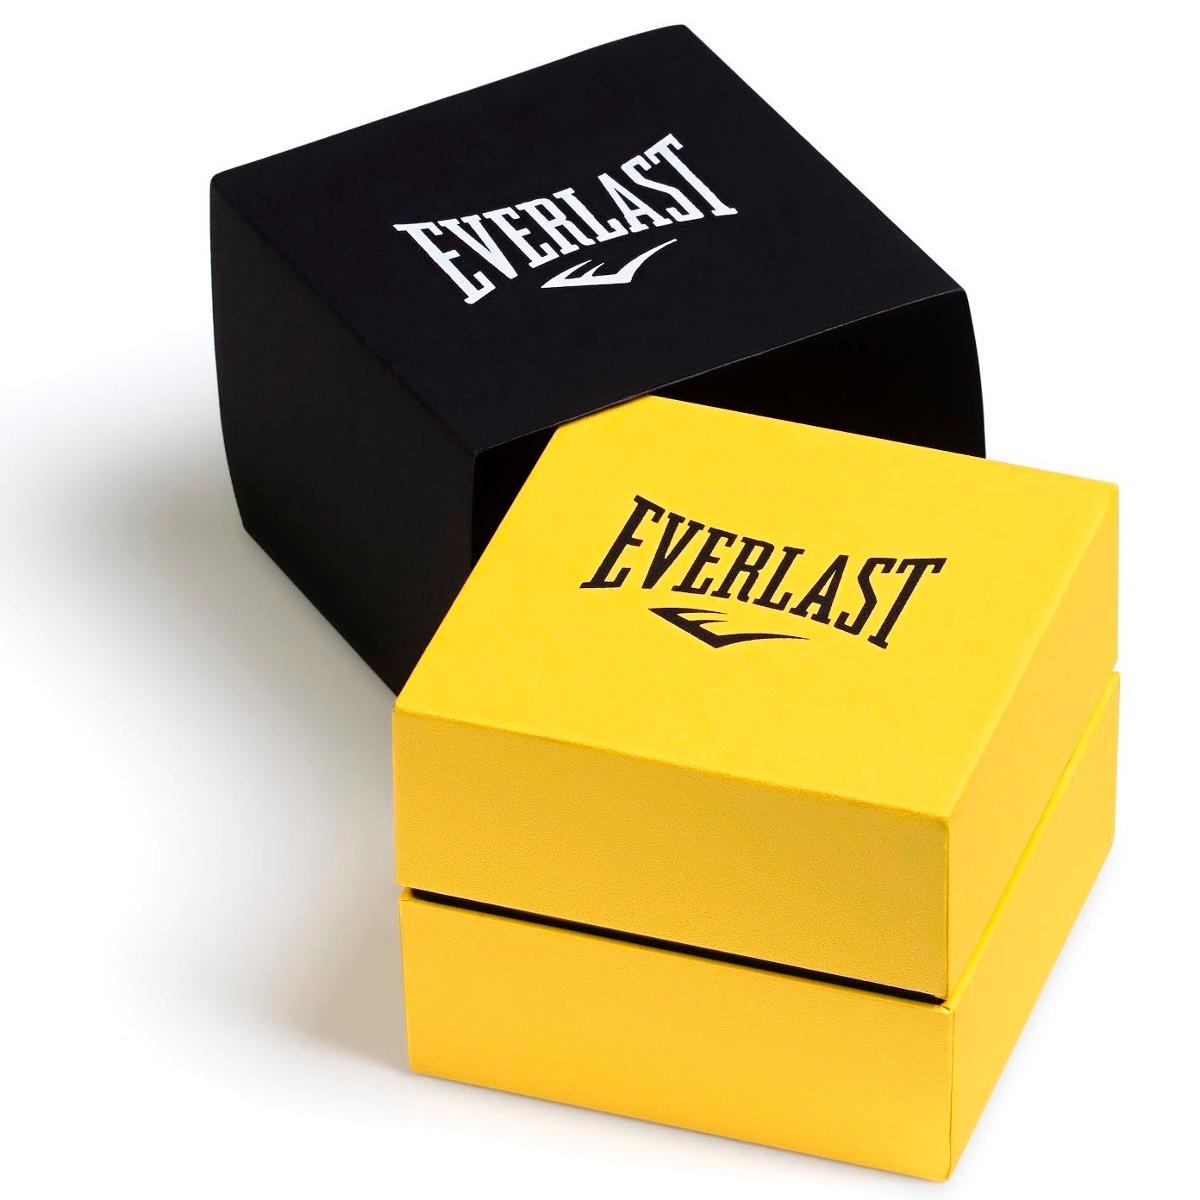 5275e07bdd1 Relógio Everlast Masculino Analógico E525 - R  999